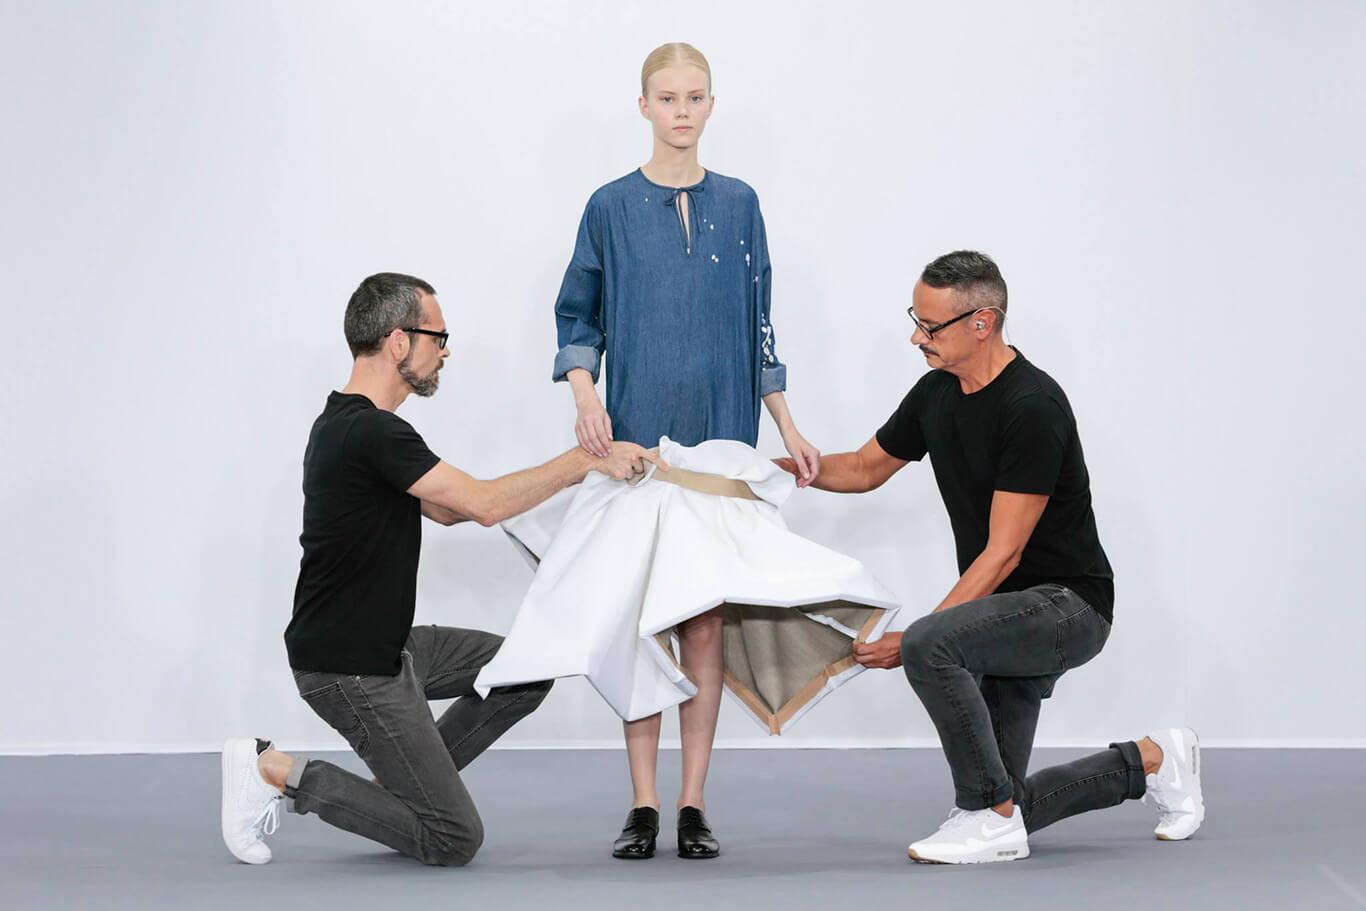 Viktor & Rolf是其中一個宣布專注高級訂製服的設計師品牌。